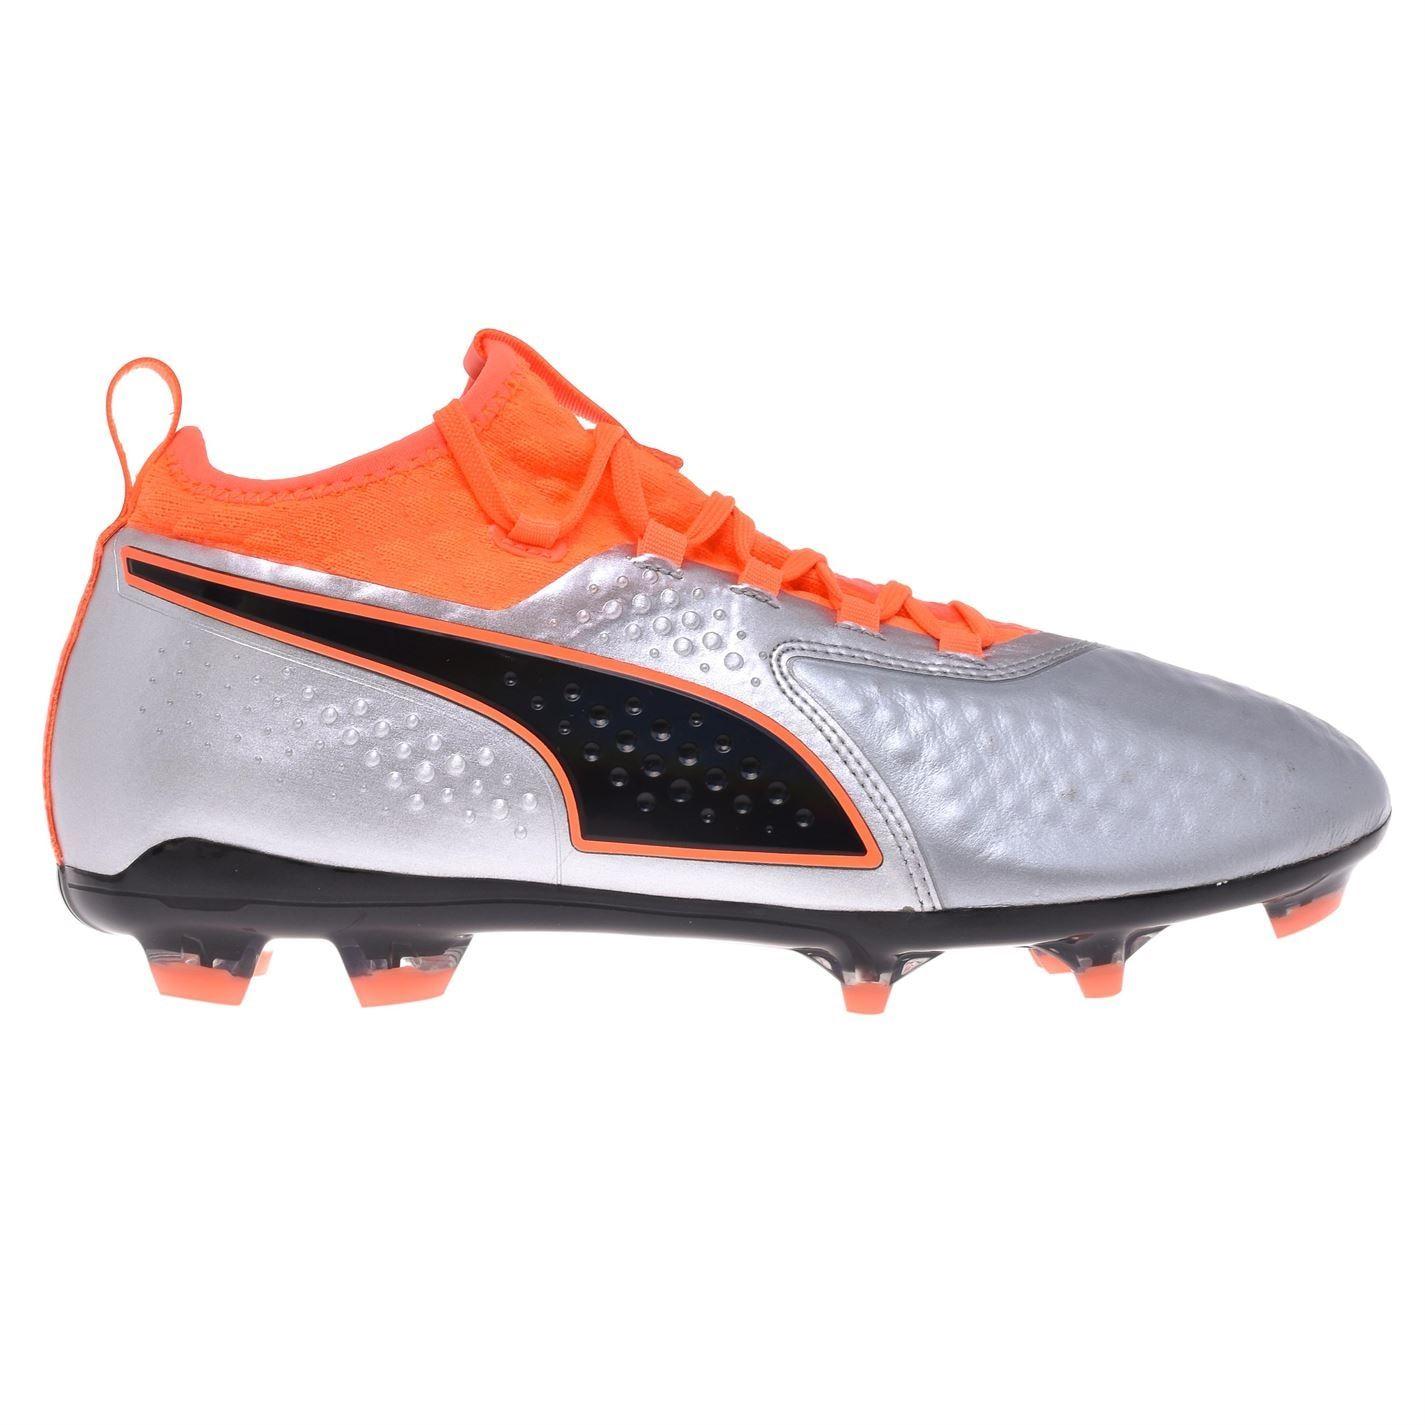 miniature 7 - Puma-One-2-Cuir-engins-fixes-Terre-Ferme-Chaussures-De-Football-Homme-Chaussures-de-foot-crampons